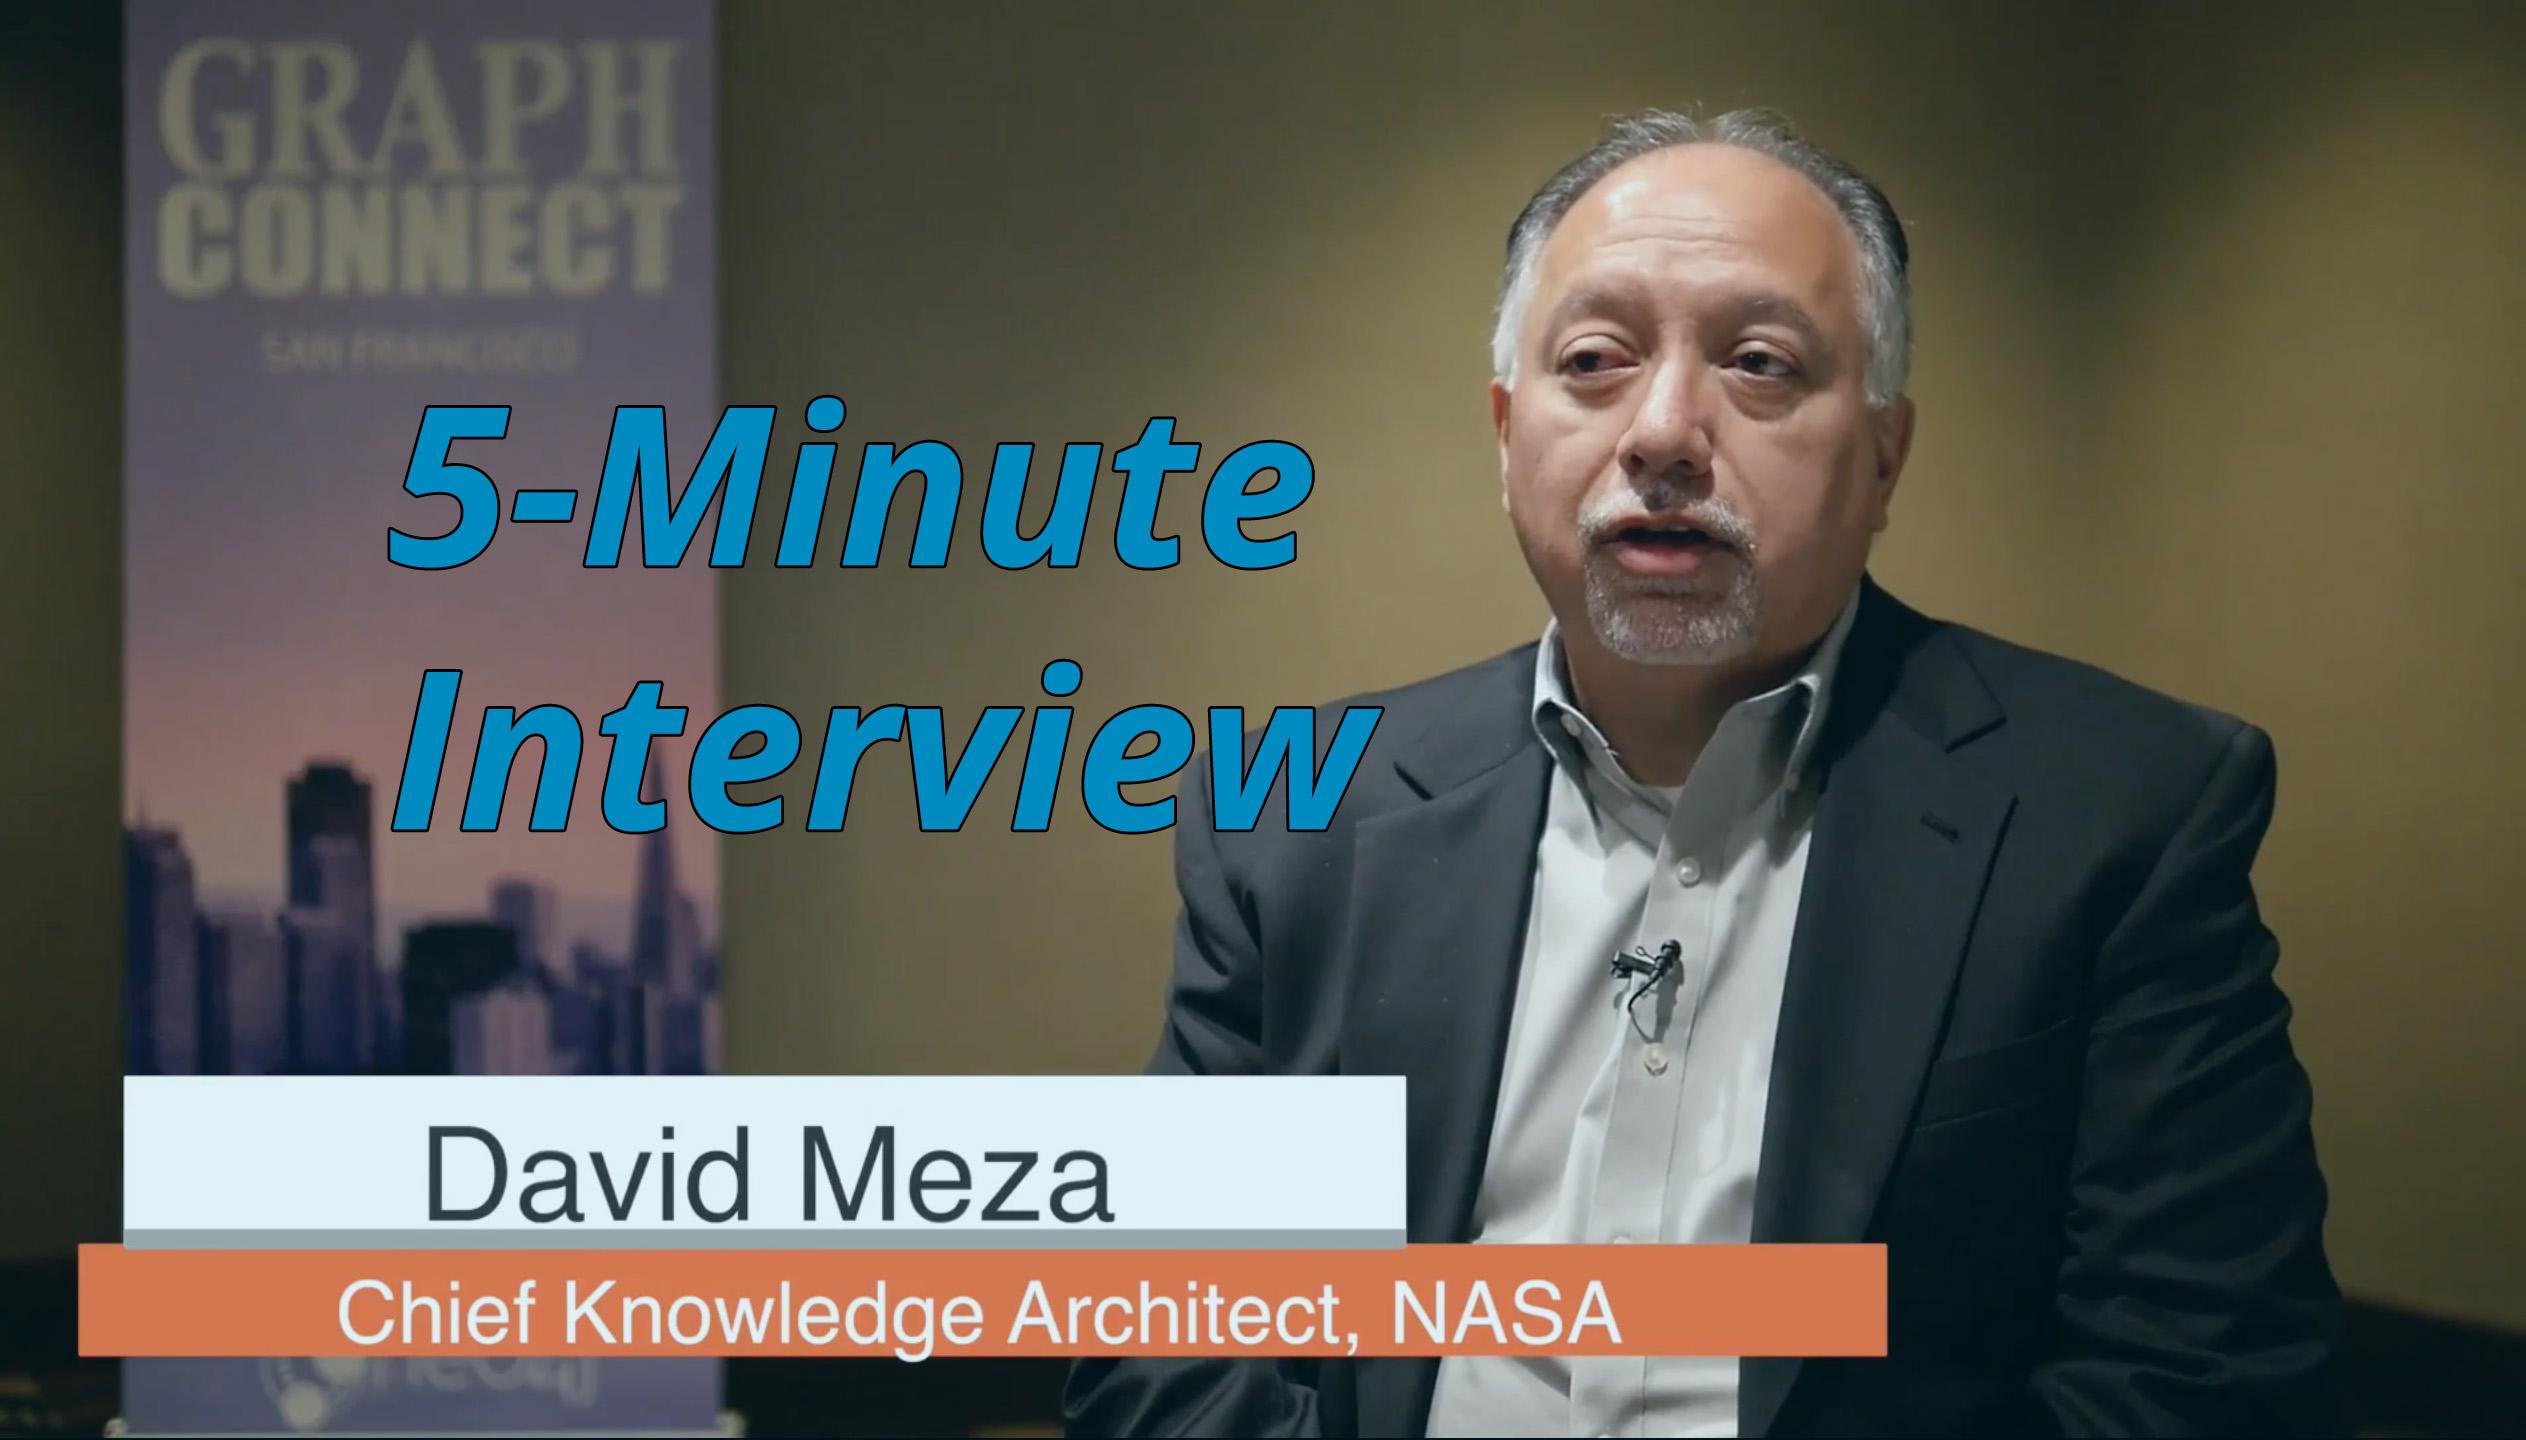 the 5 minute interview david meza chief knowledge architect nasa